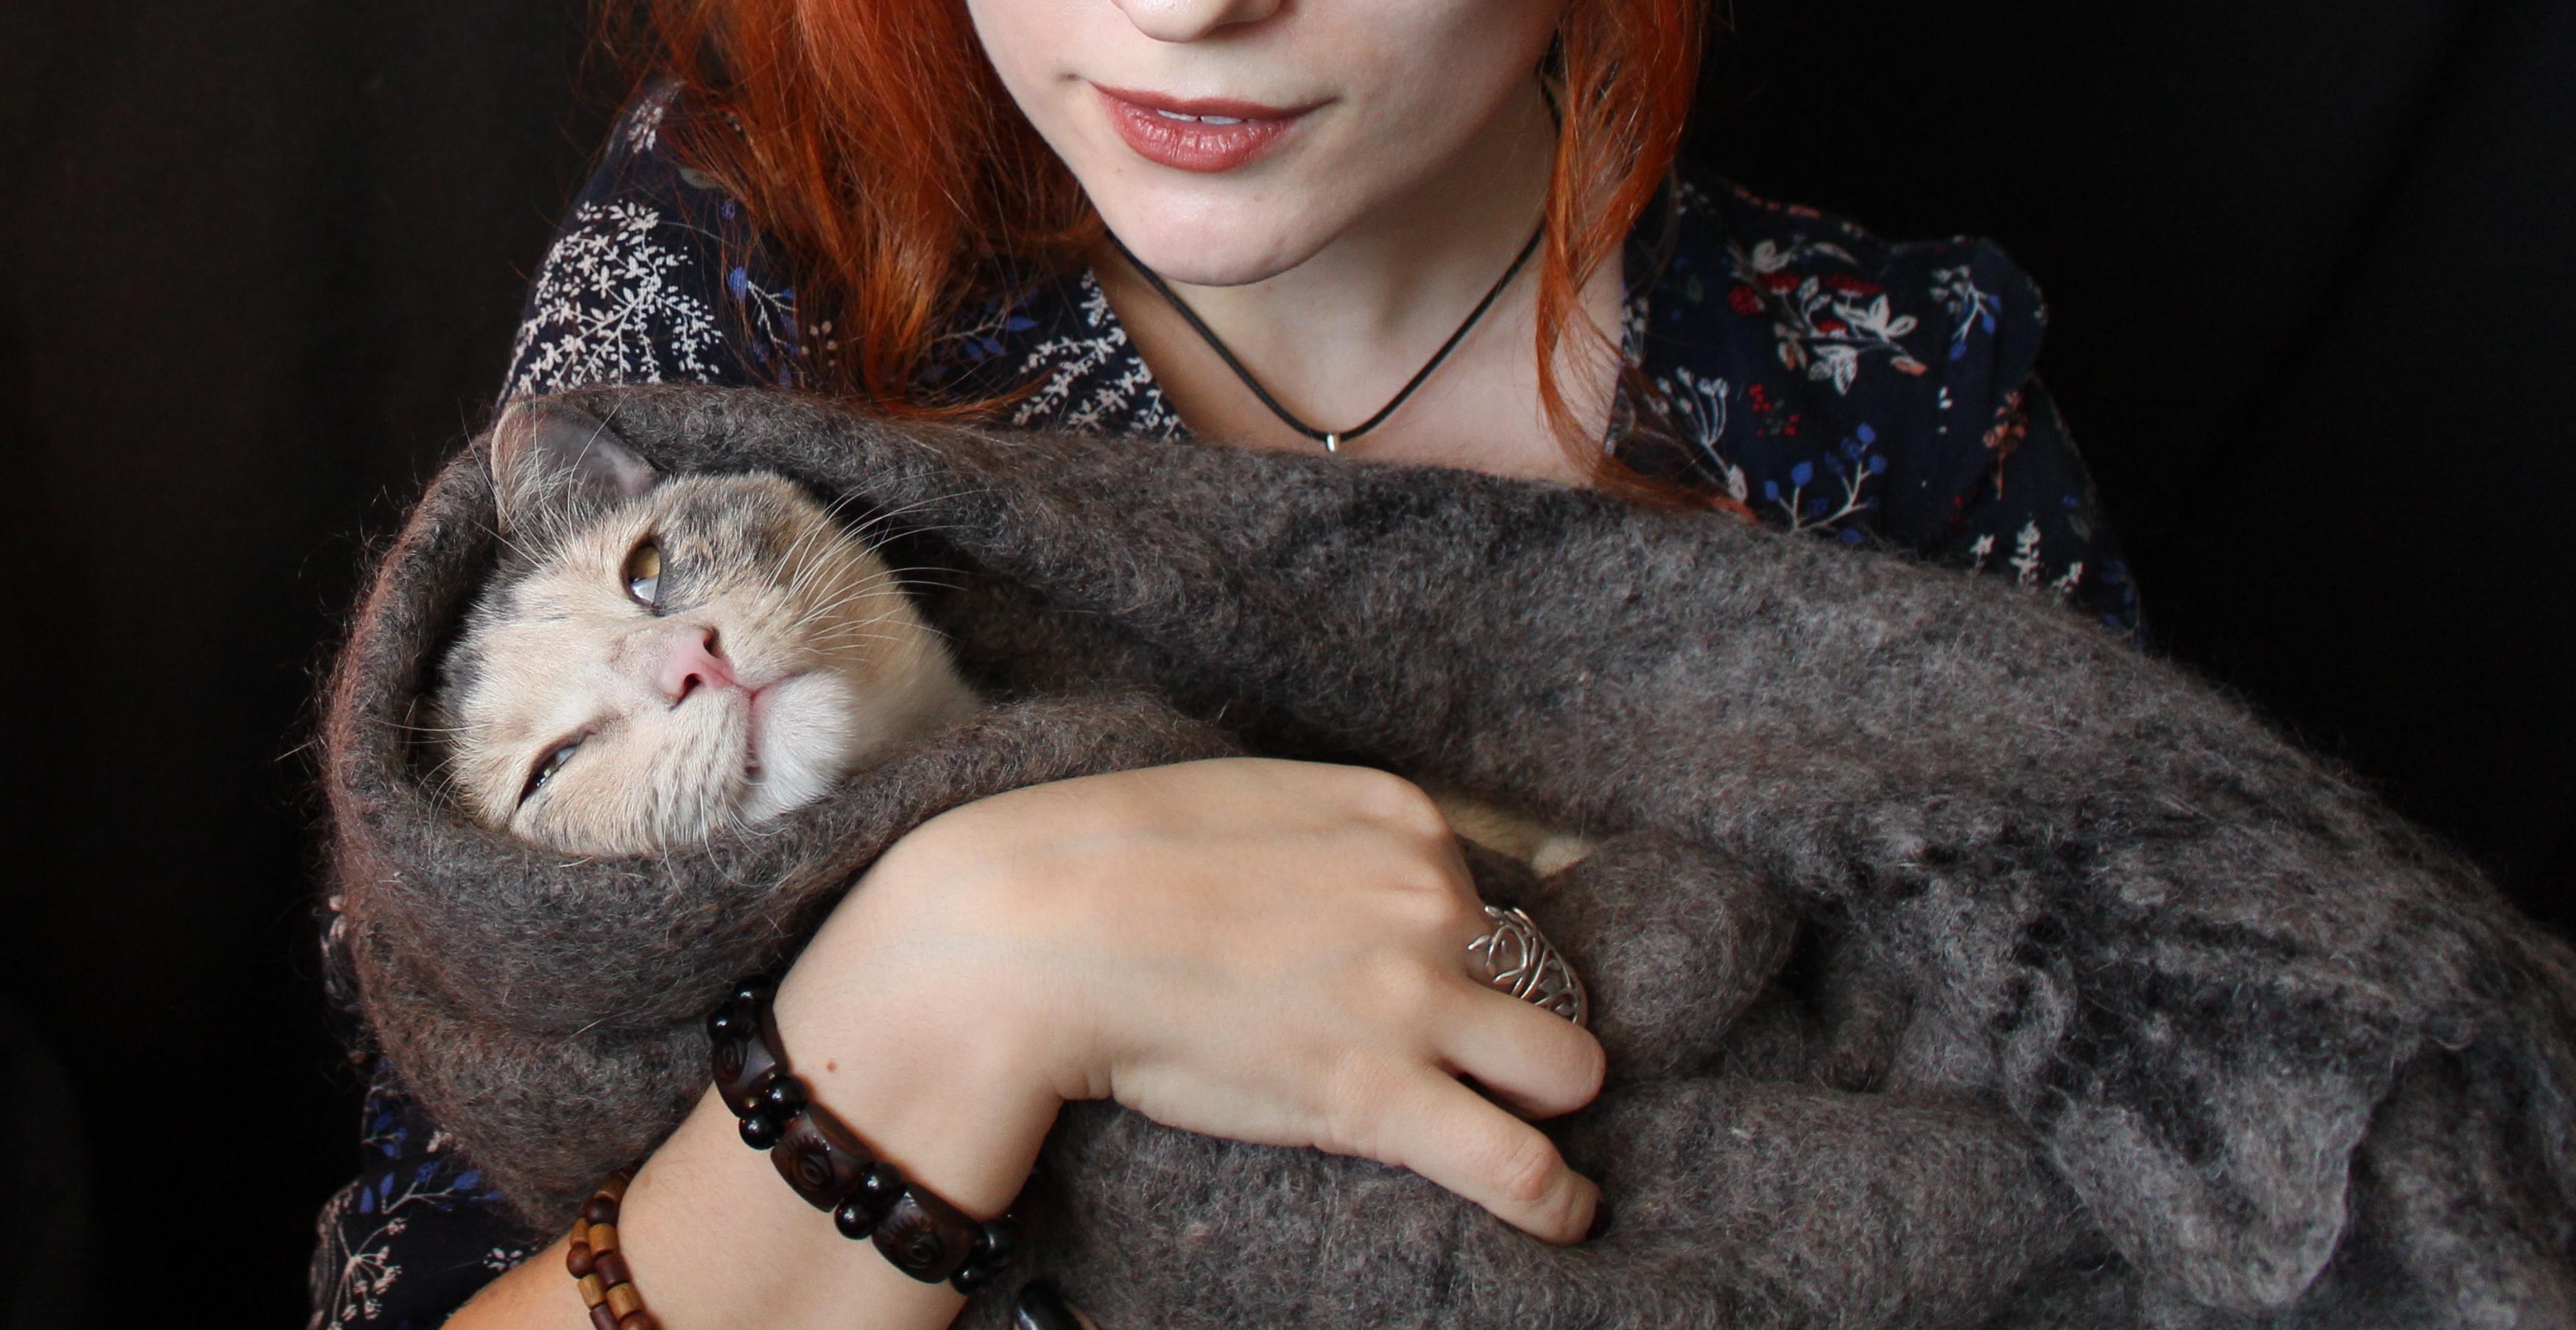 Plyushka the Cat